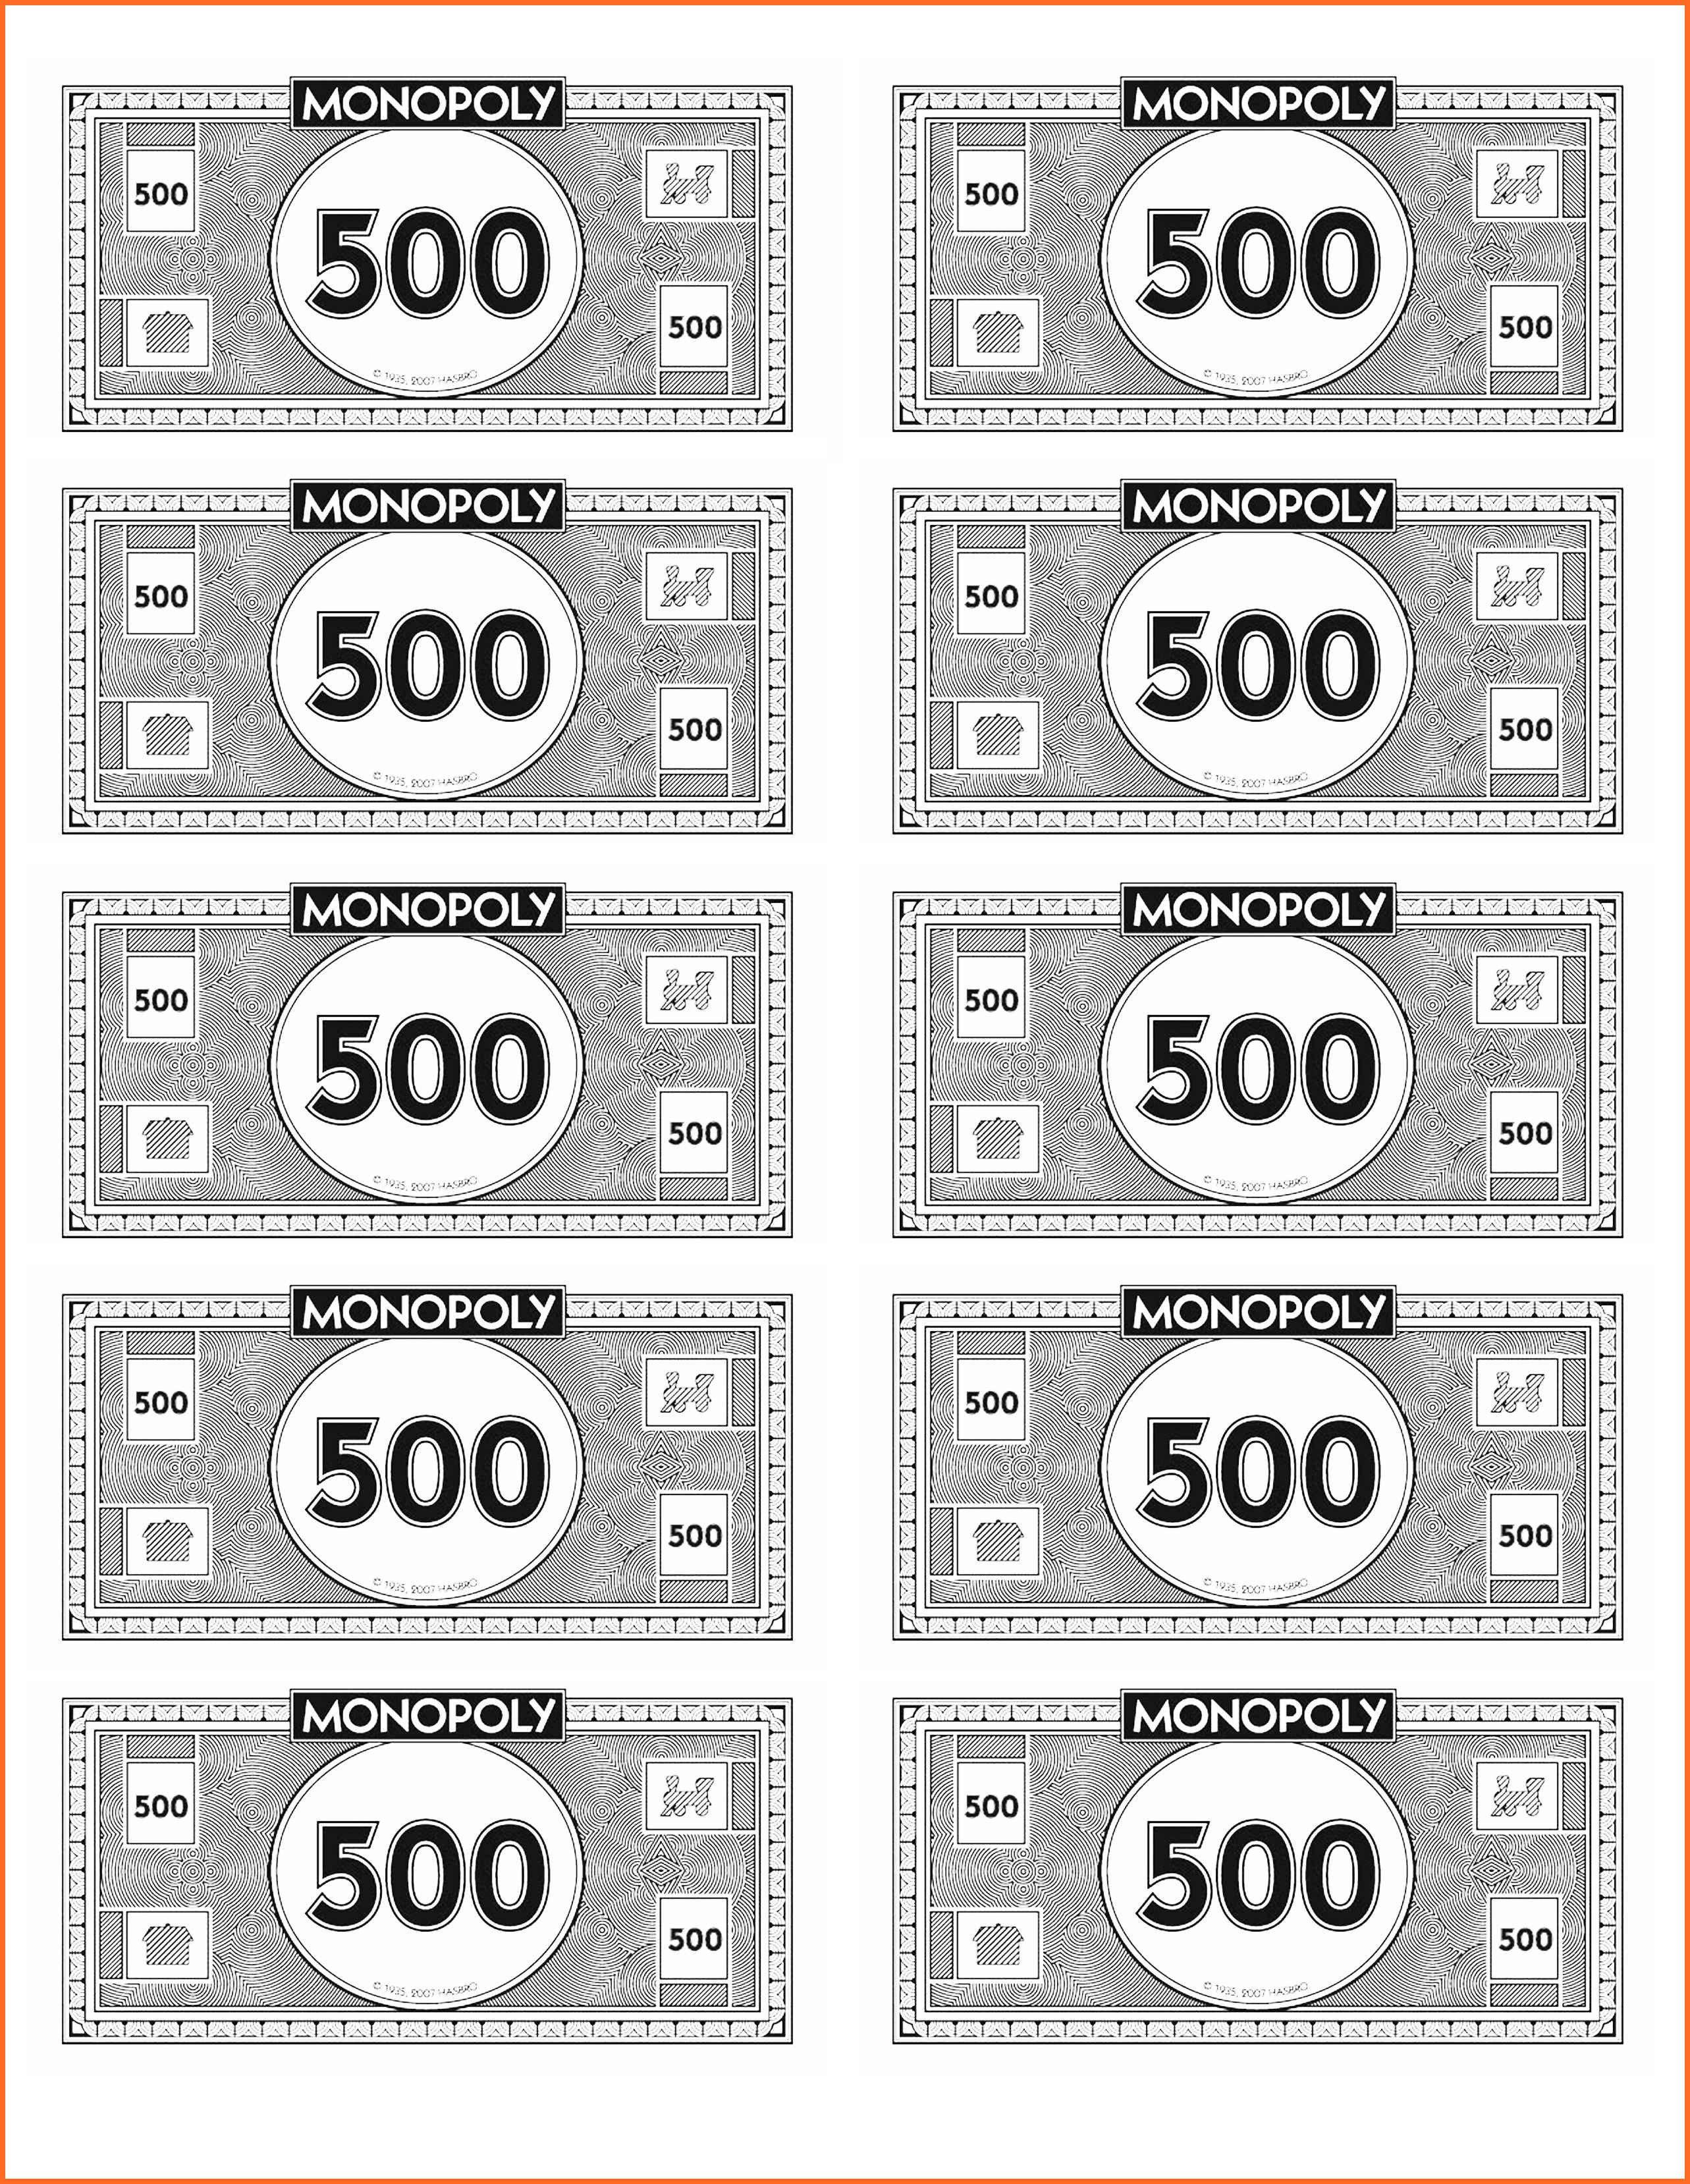 Monopoly Money Black and White Printable Monopoly Money Printable 360 Degree